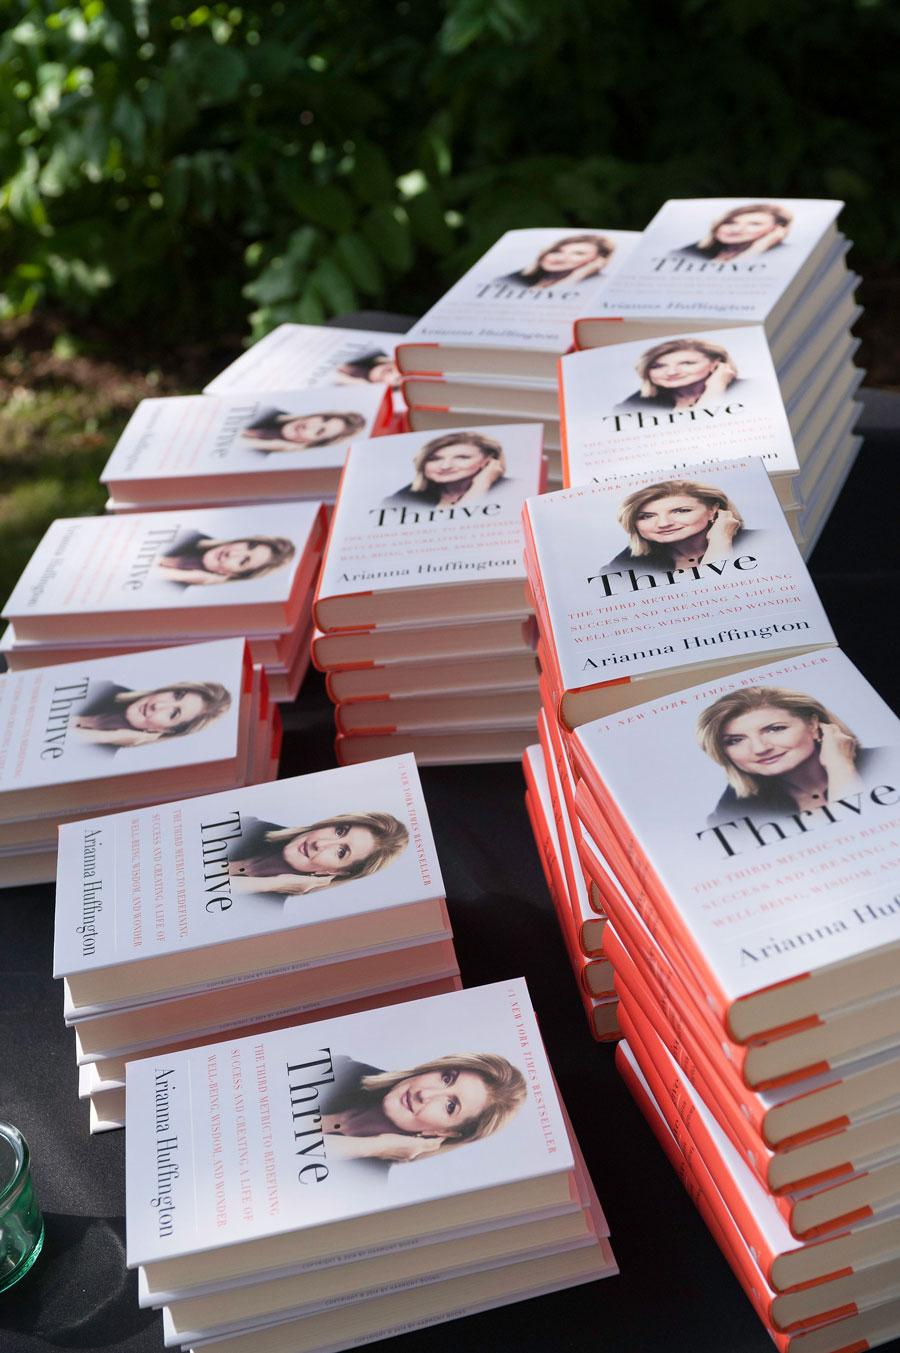 arriana_huffington_thrive_books.jpg